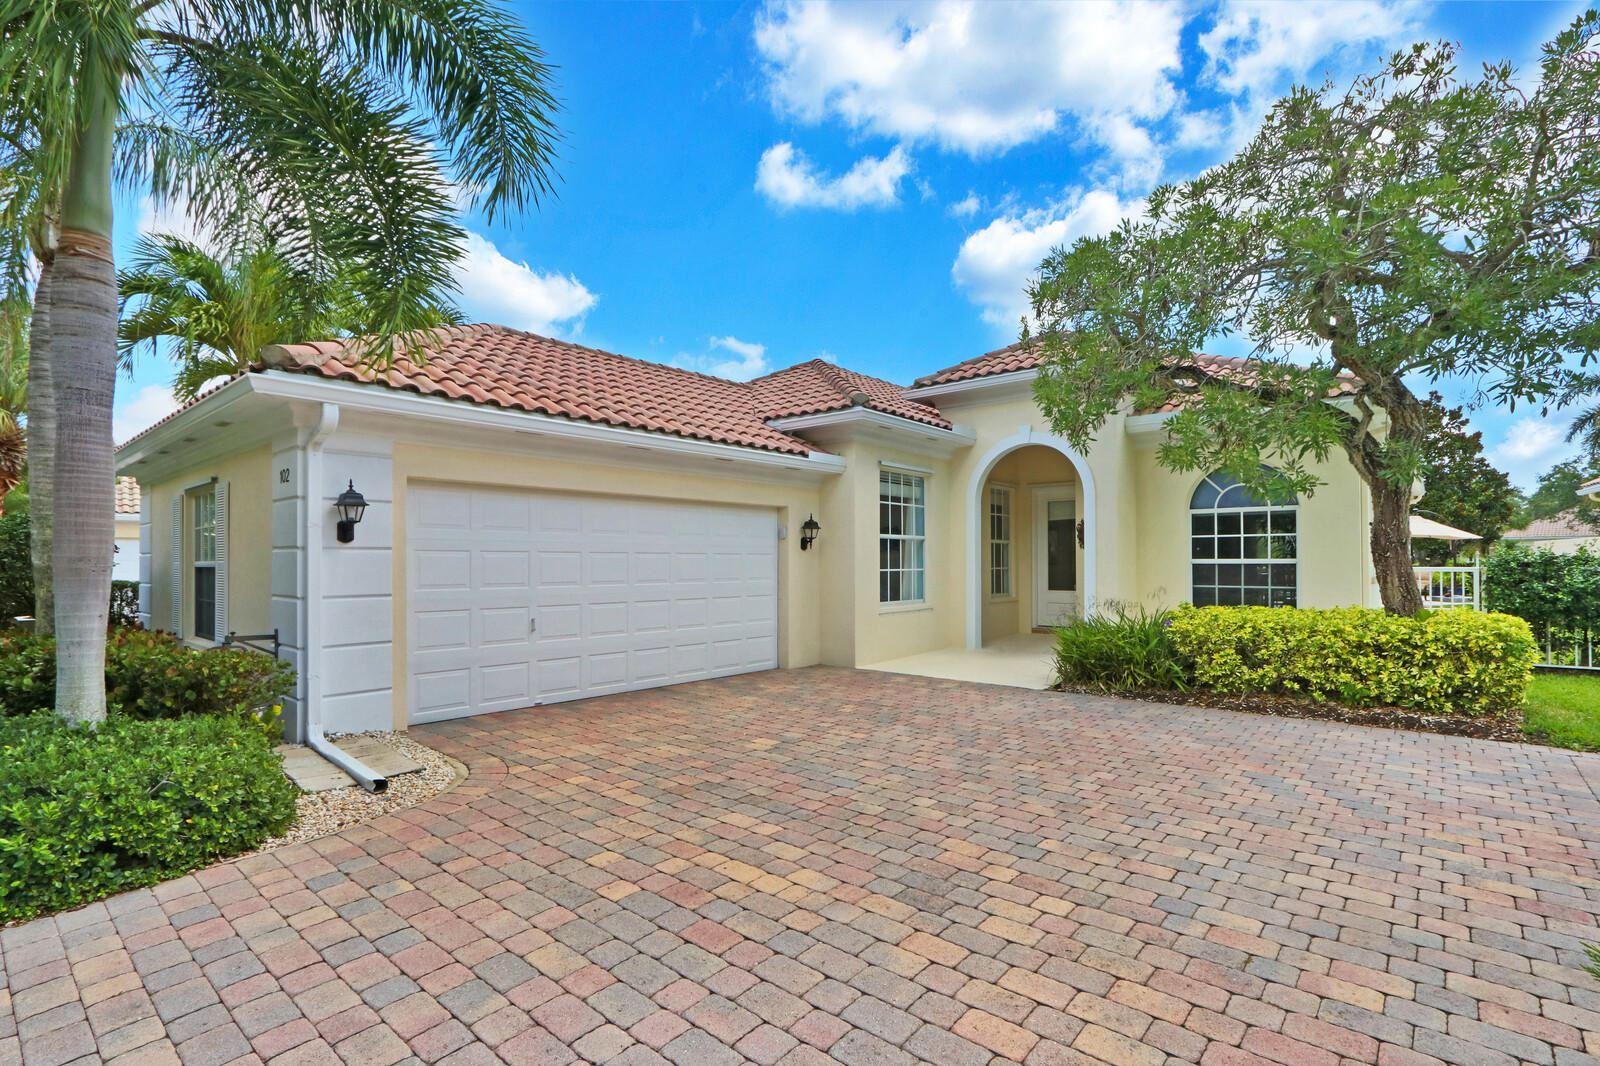 Photo of 102 Euphrates Circle, Palm Beach Gardens, FL 33410 (MLS # RX-10725853)